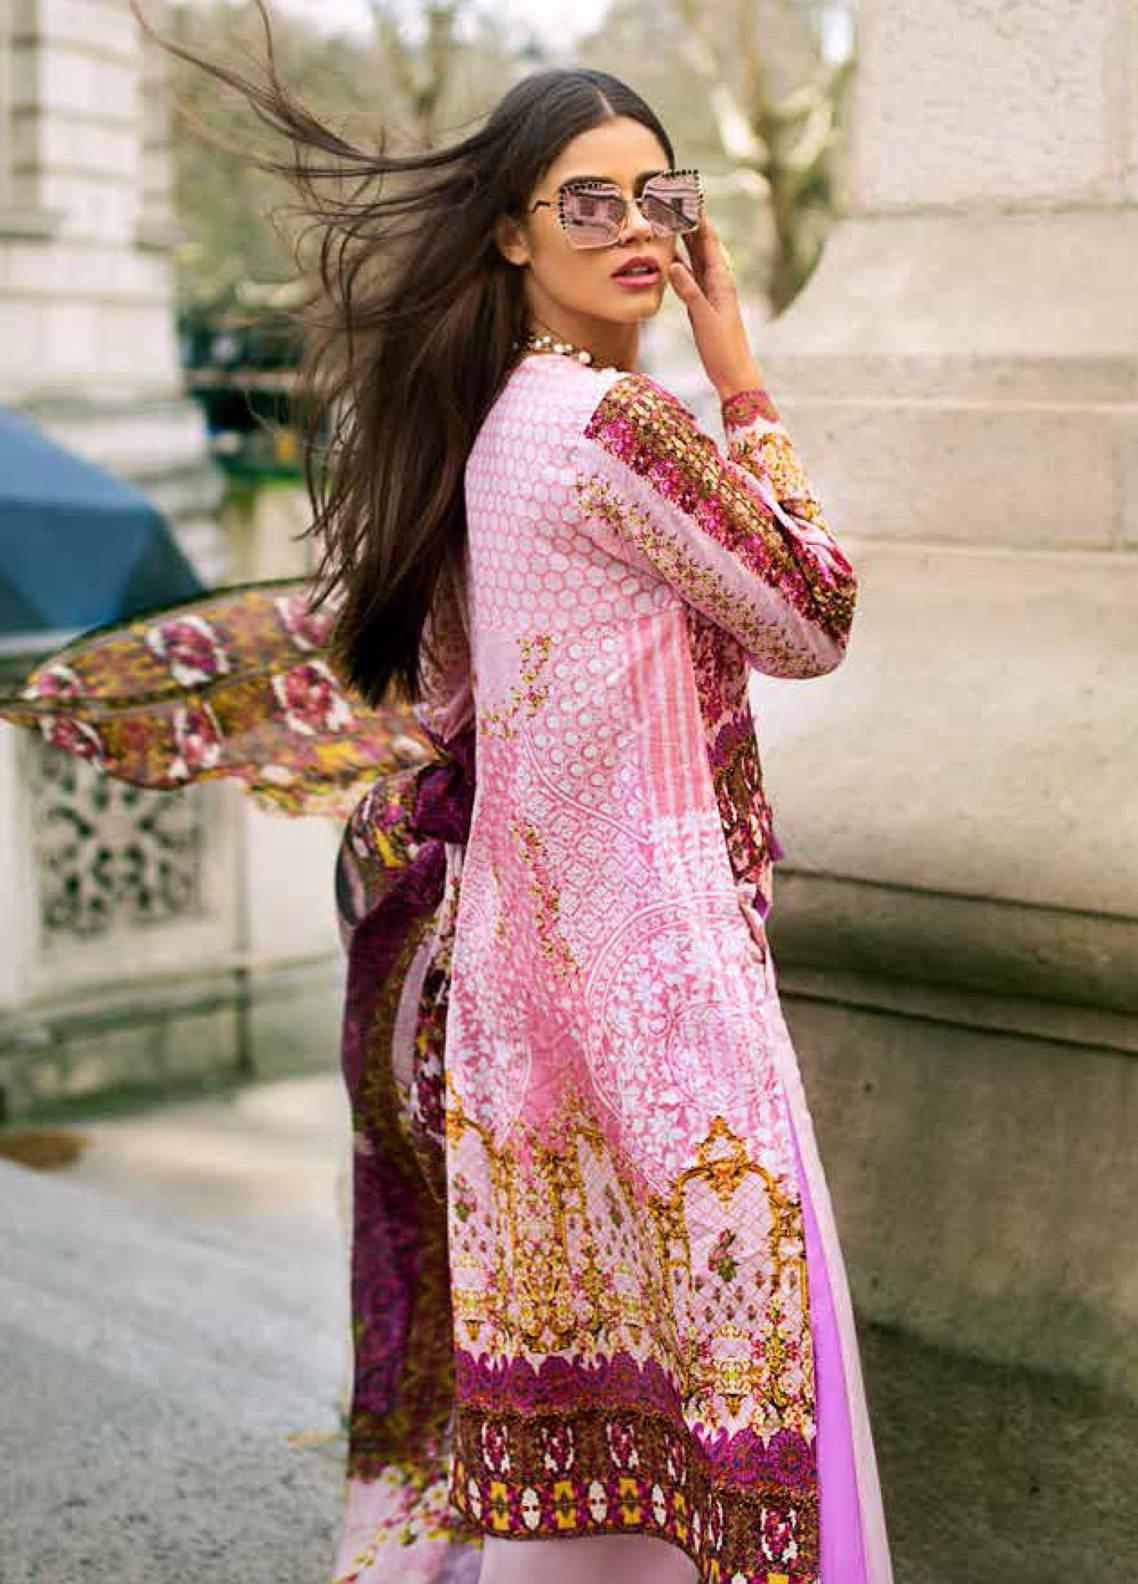 964415c190 Honey Waqar Online: Honey Waqar Lawn Suits Collection 2019 - Buy ...